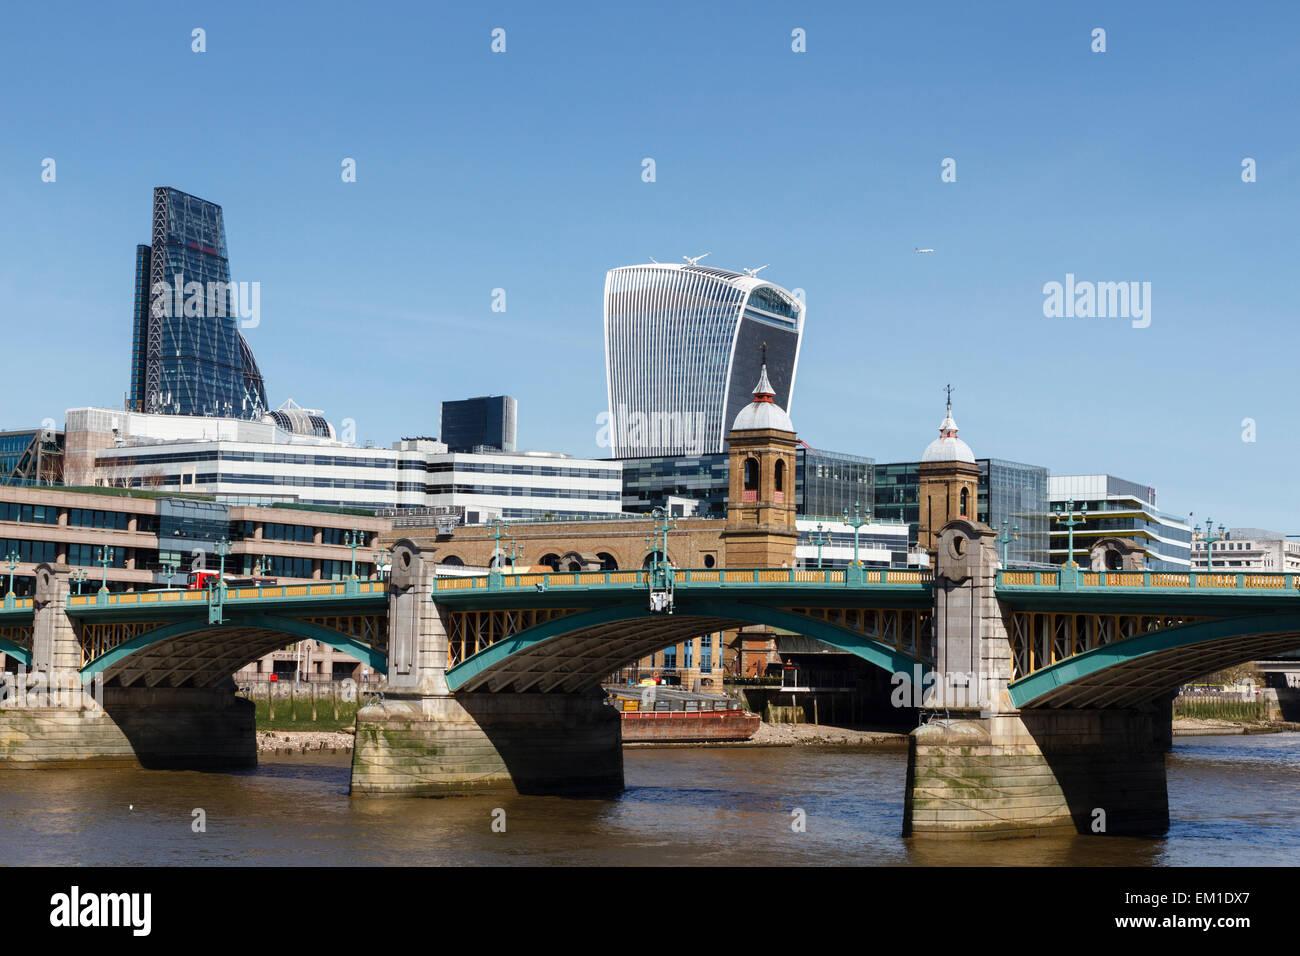 Southwark Bridge, London with 20 Fenchurch Street in the background, England, UK - Stock Image